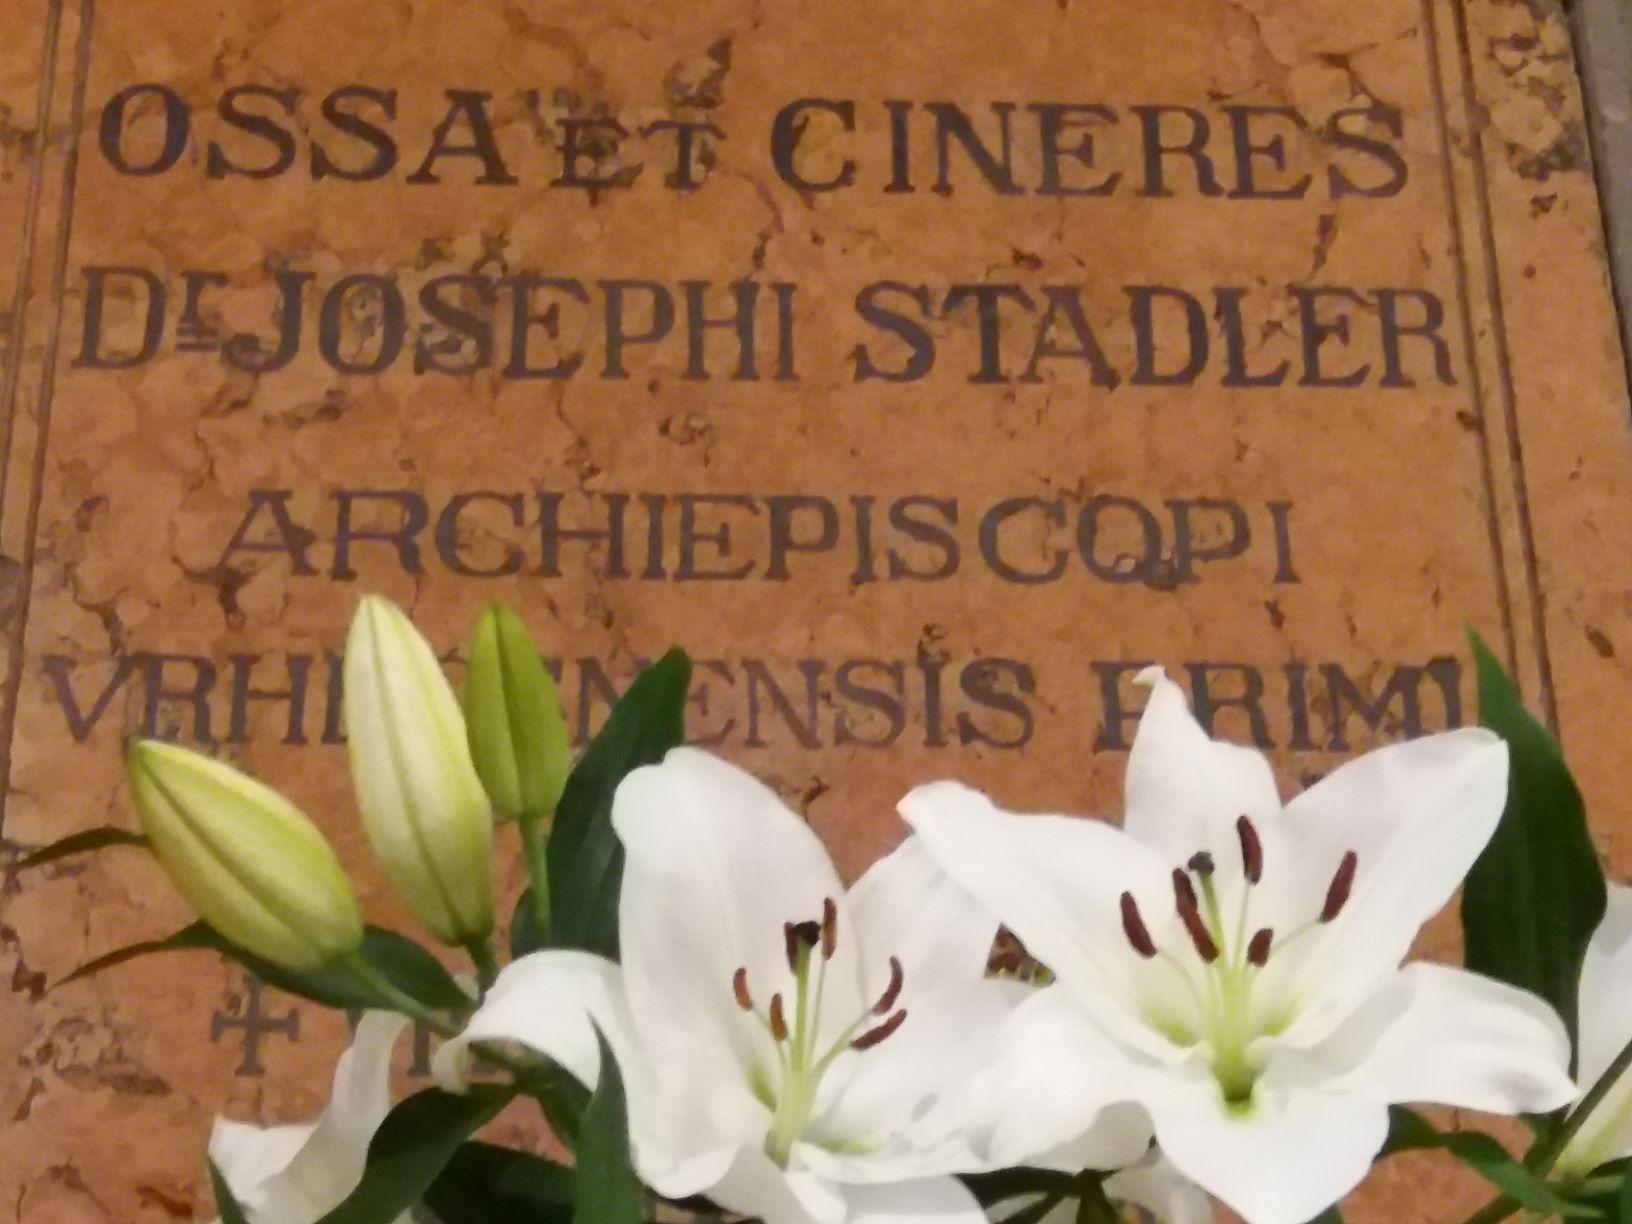 Grob utemeljitelja